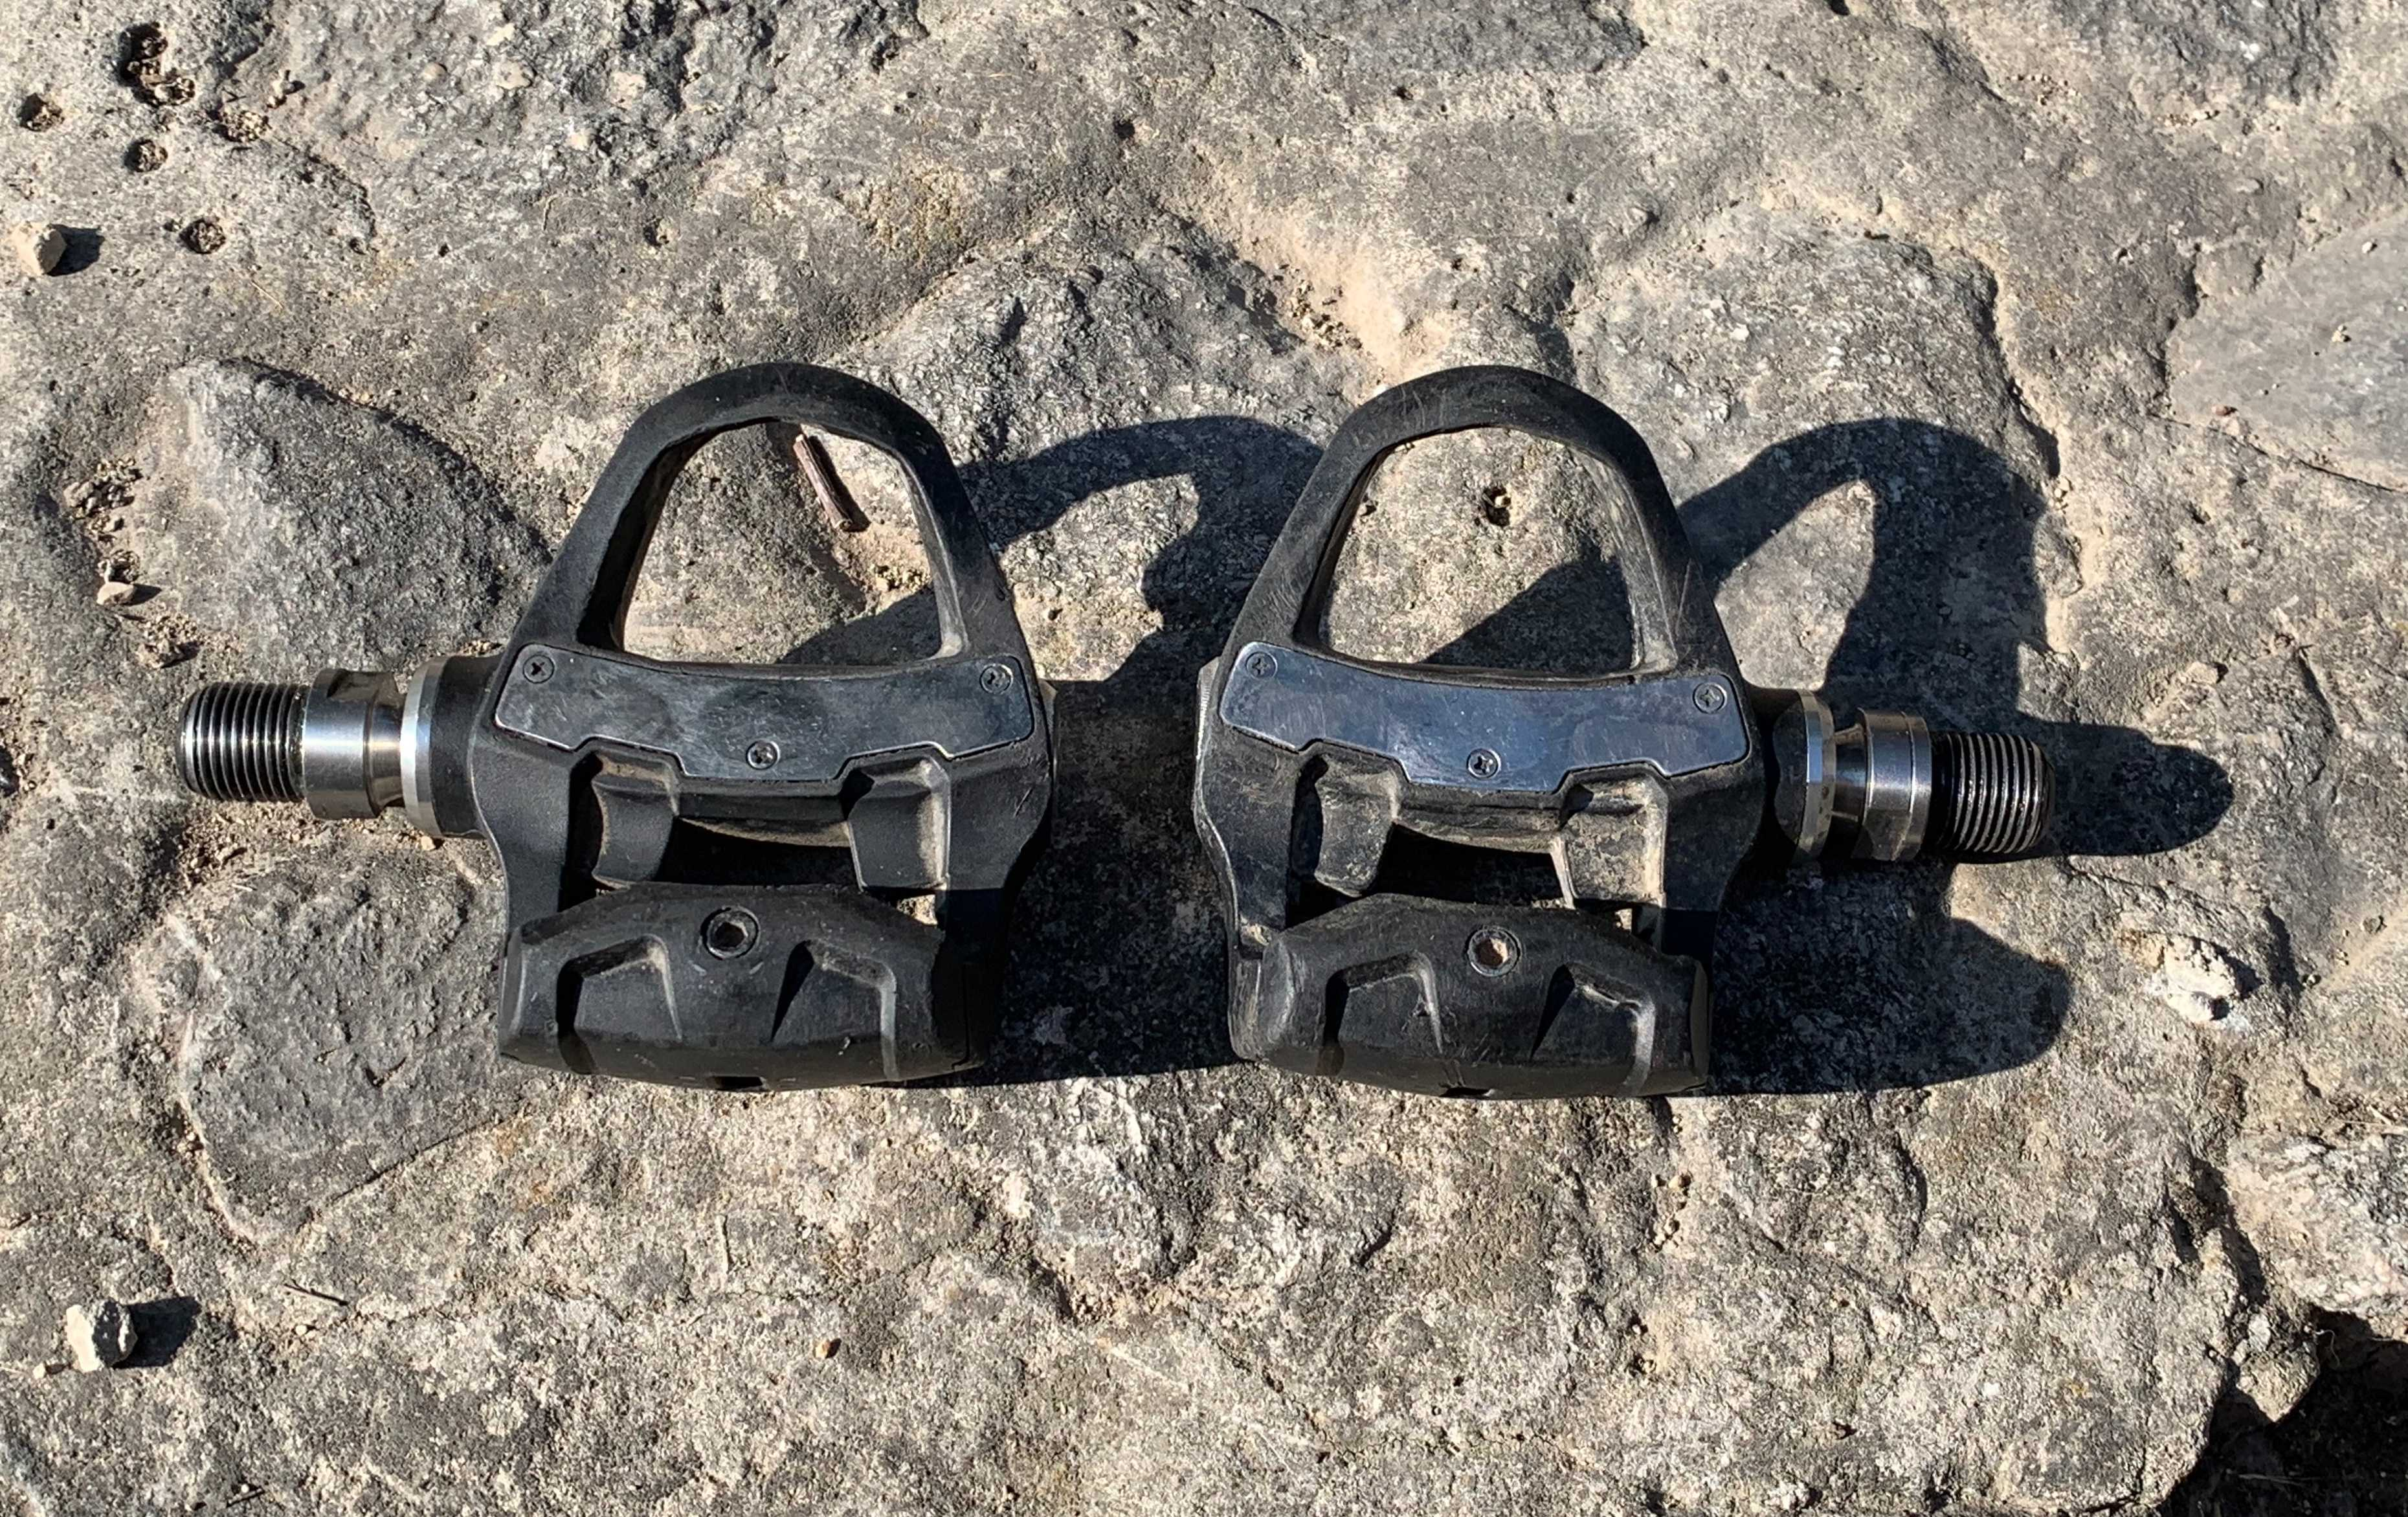 Garmin Vector 3: Dodgy Power Pedals